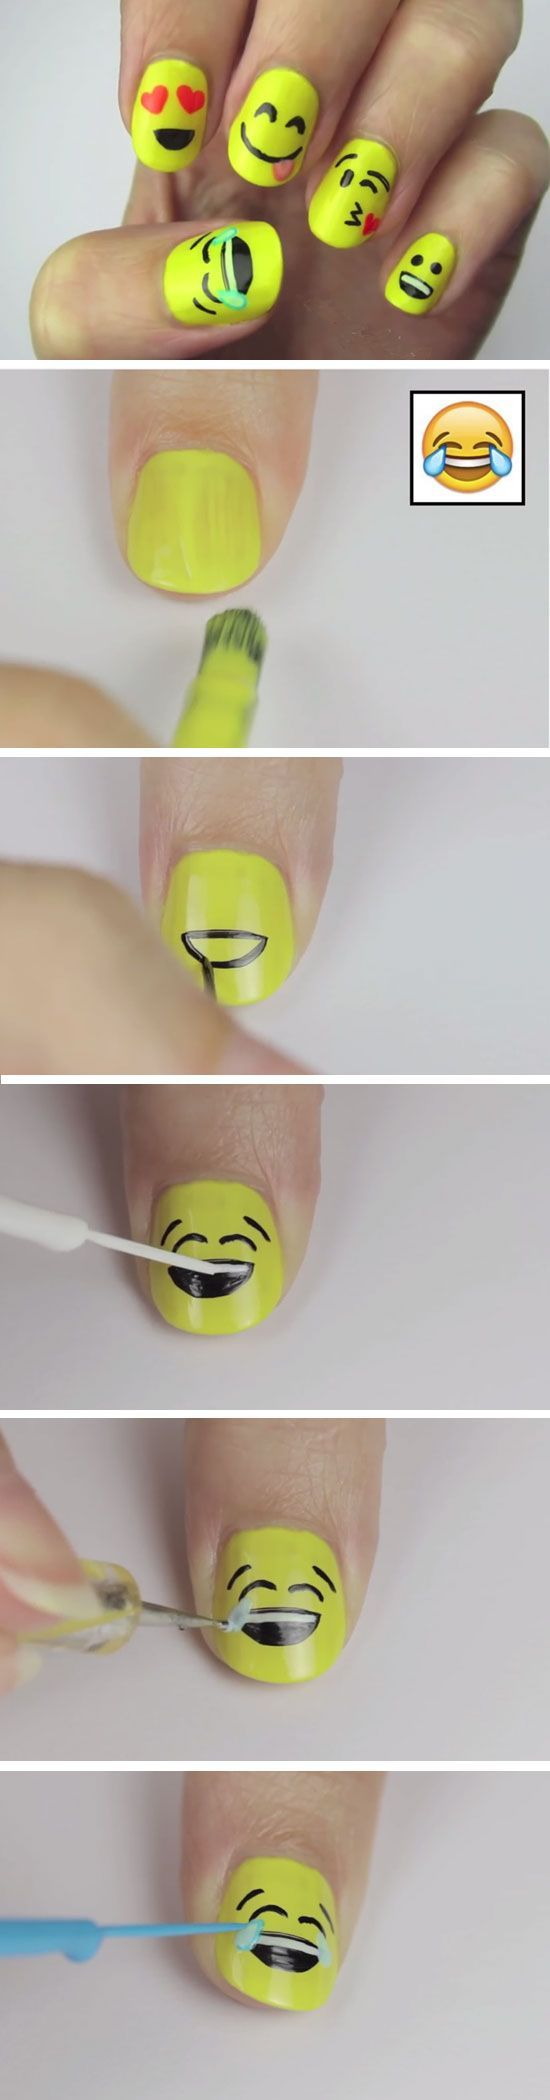 88 best Nail Art for Kids images on Pinterest | Nail scissors, Nail ...